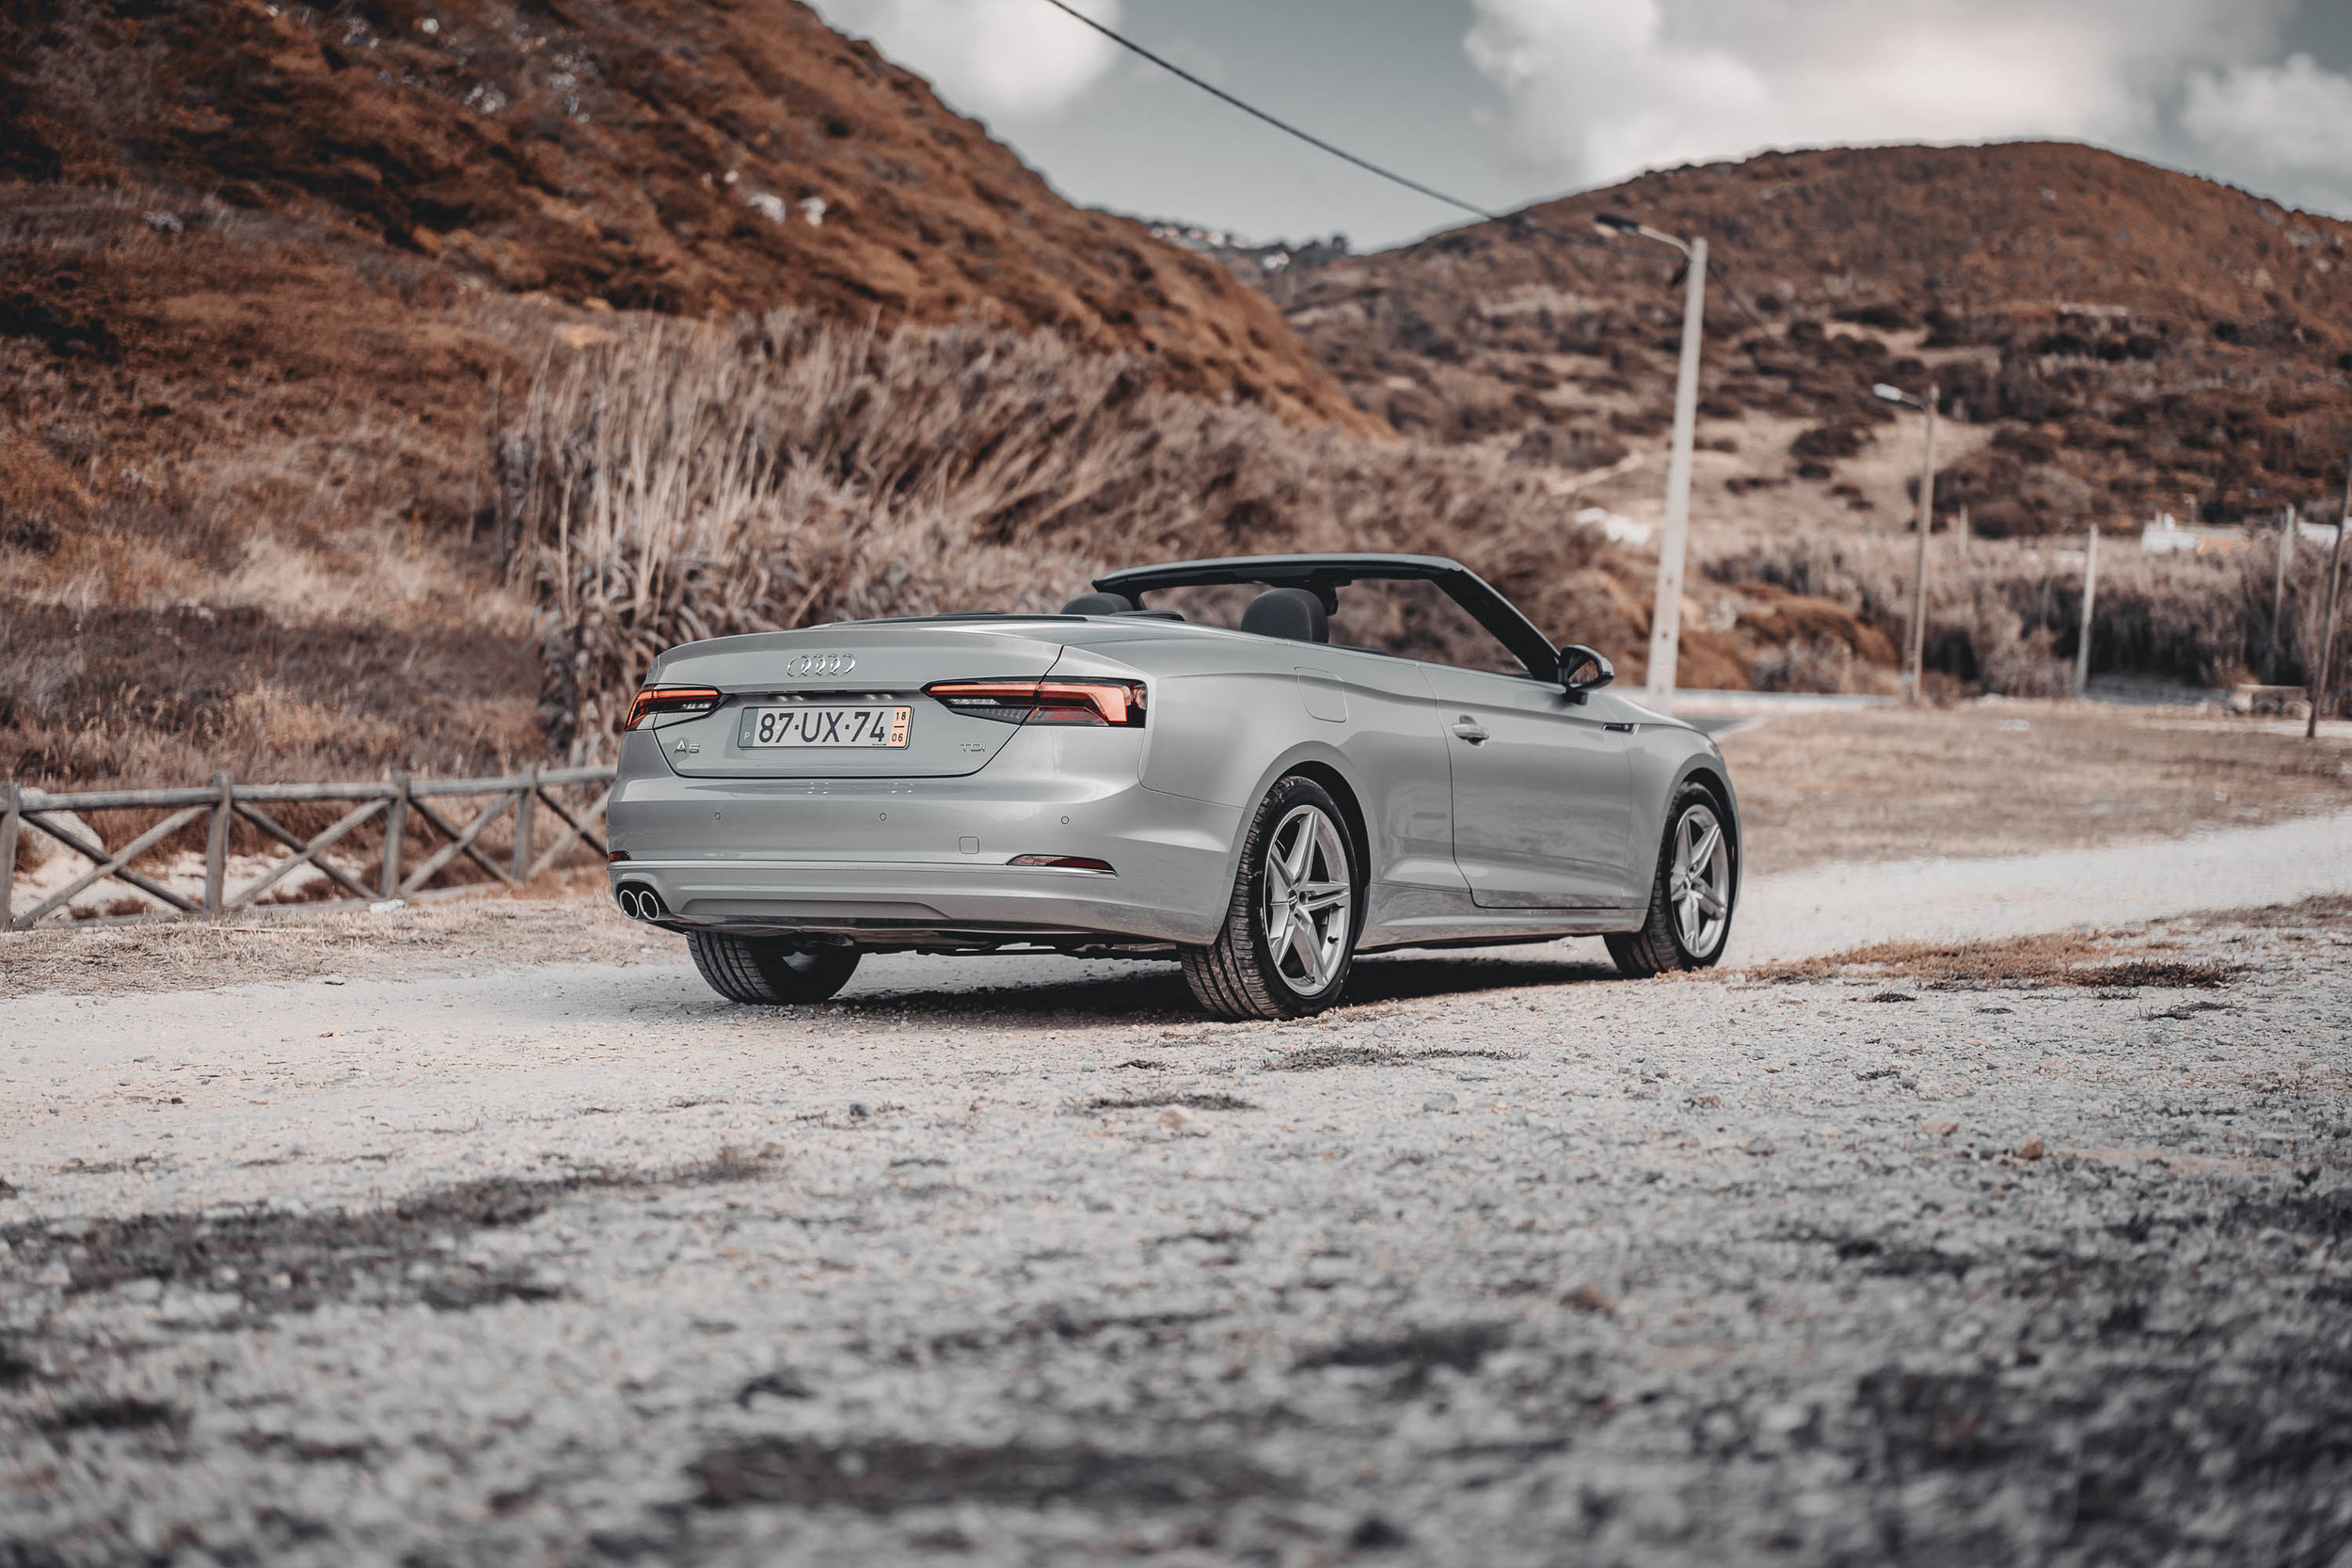 Maximilian_Otto_Audi_A5_Cabriolet_Portugal_15_WEB.jpg